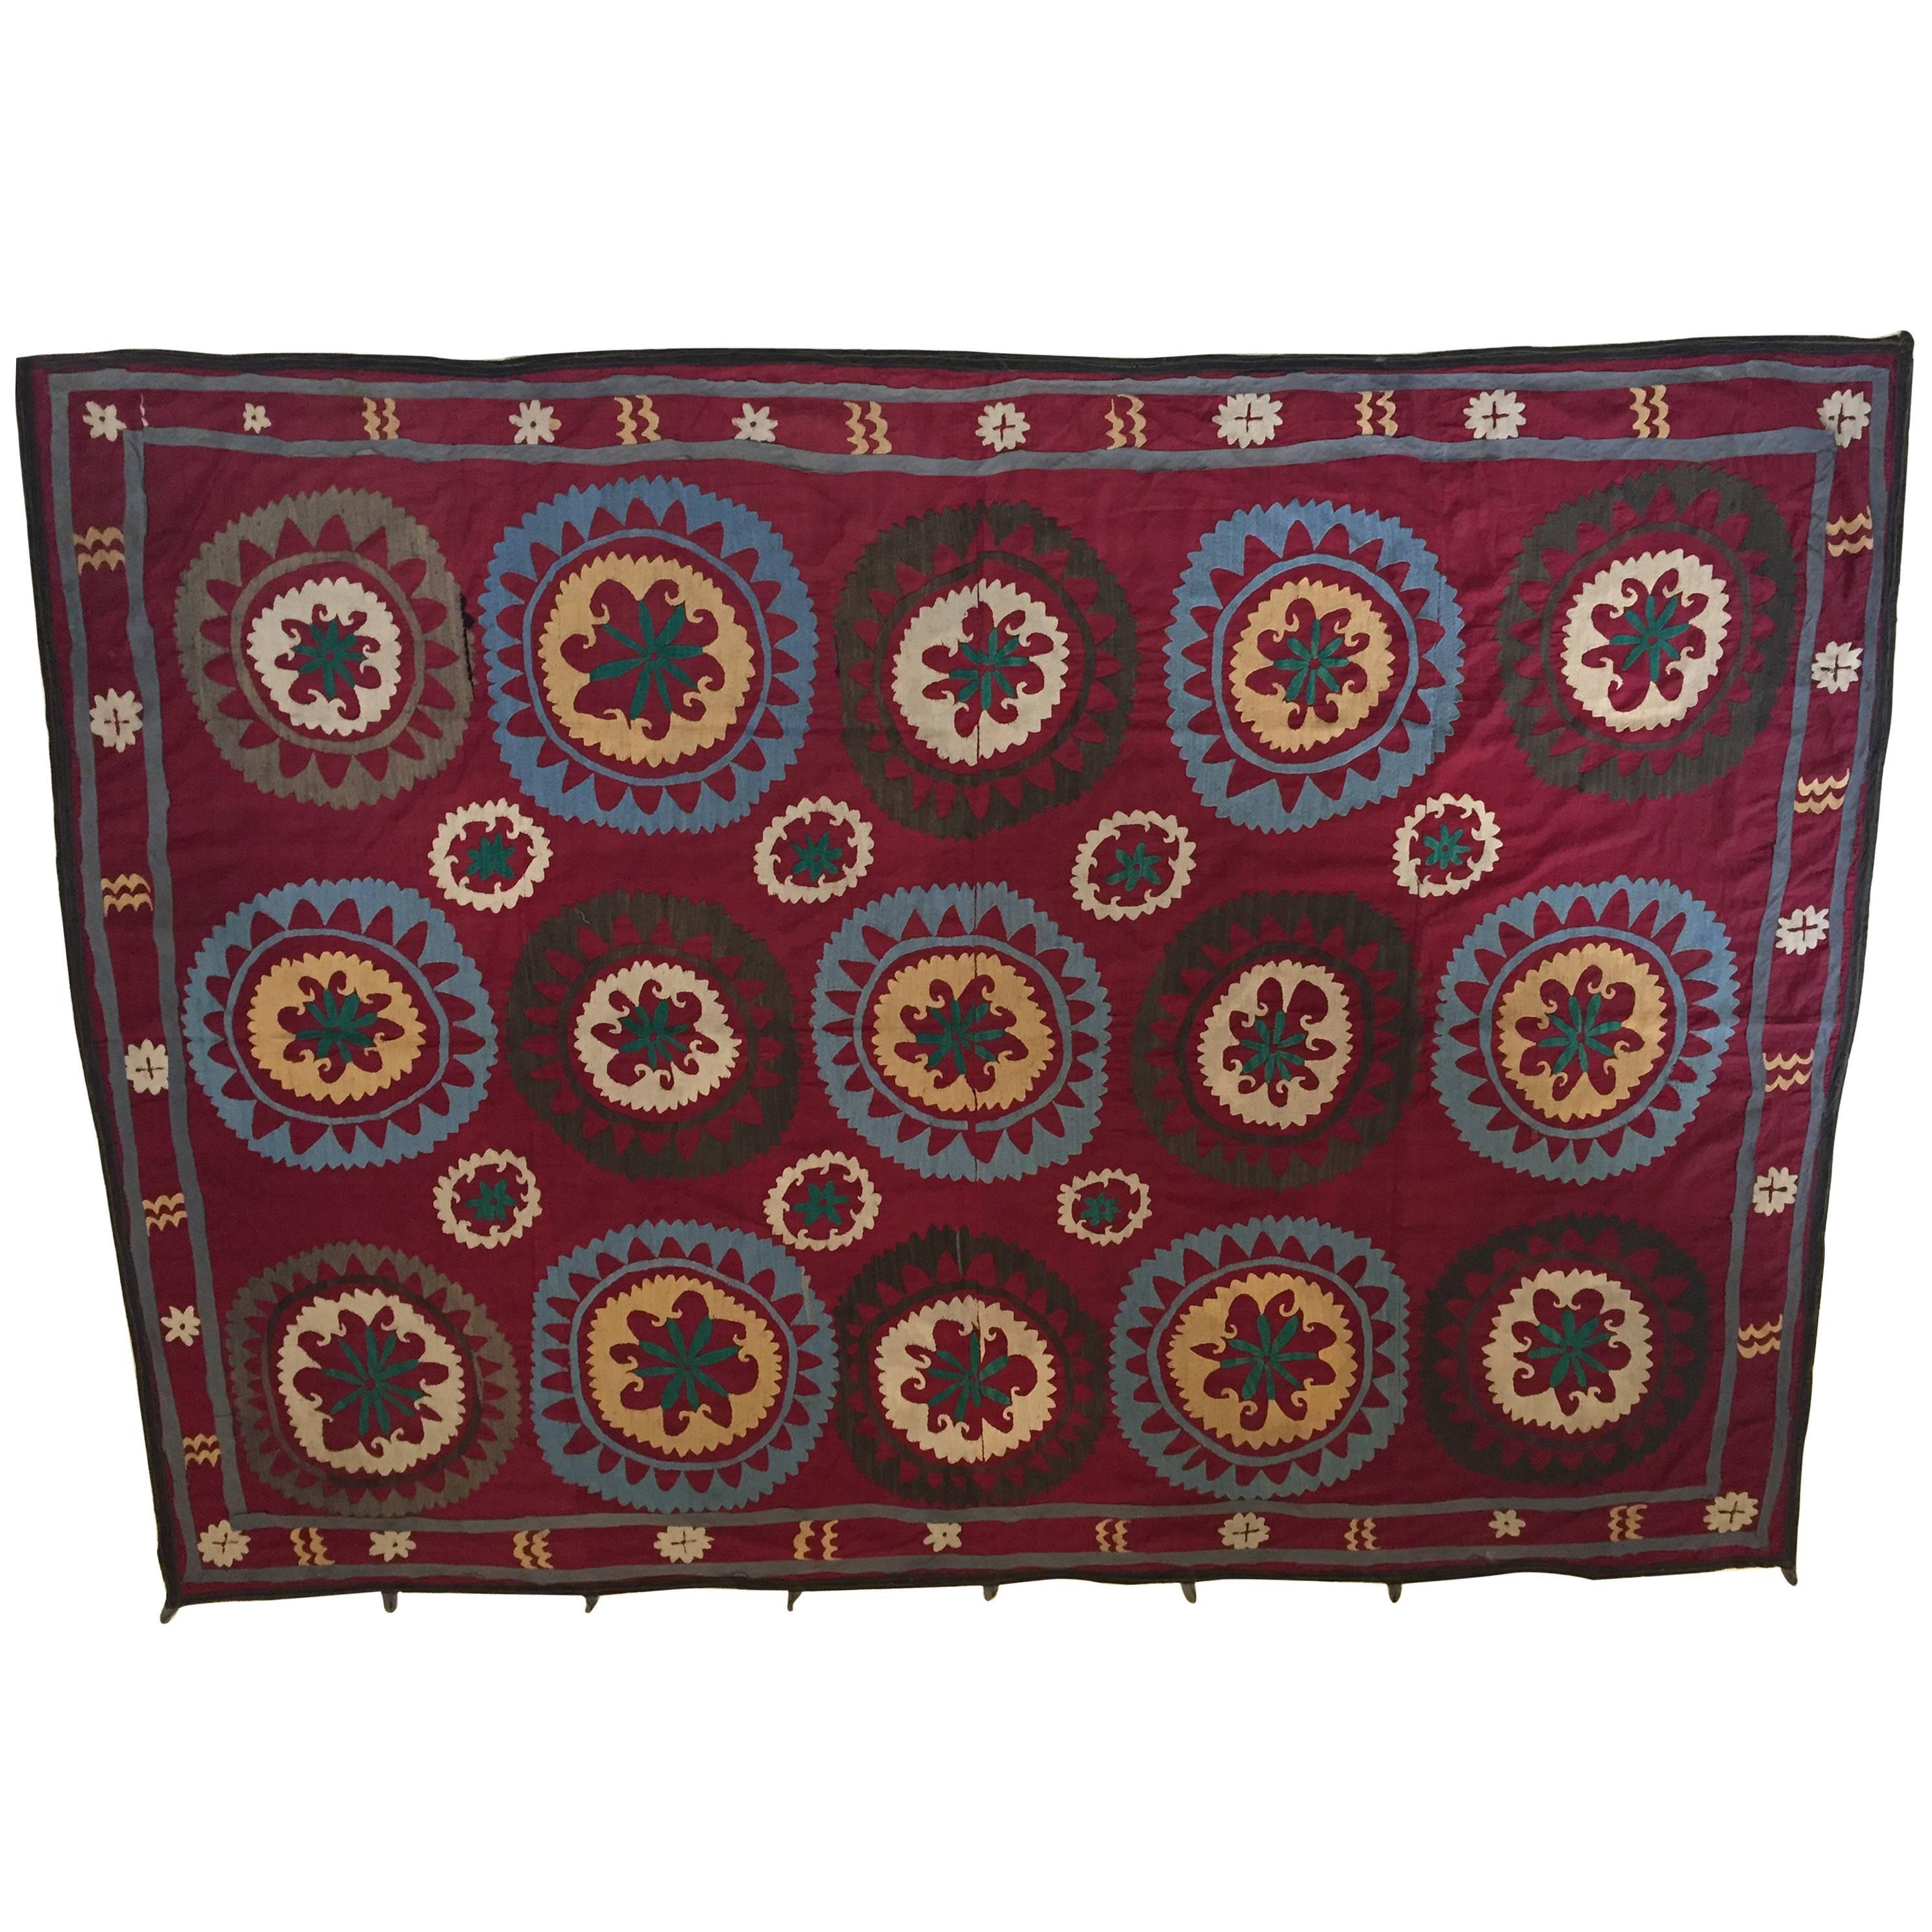 Large Vintage Uzbek Suzani Needlework Textile Blanket or Tapestry